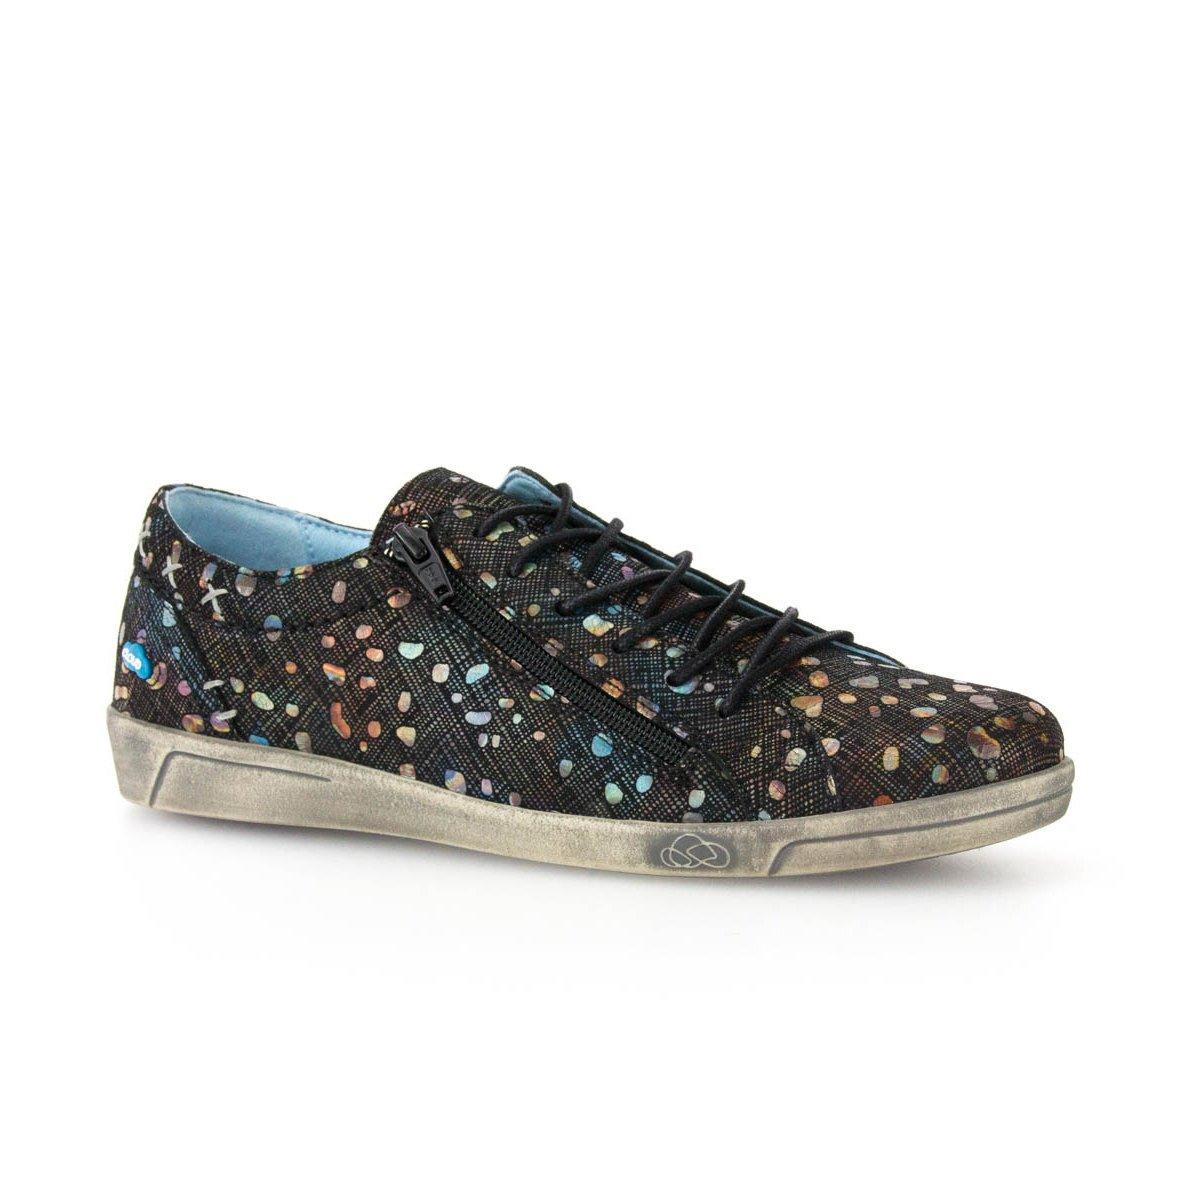 Cloud Footwear Women's Aika Fashion Sneaker B07B13PM2J 38 M EU|Bubbles